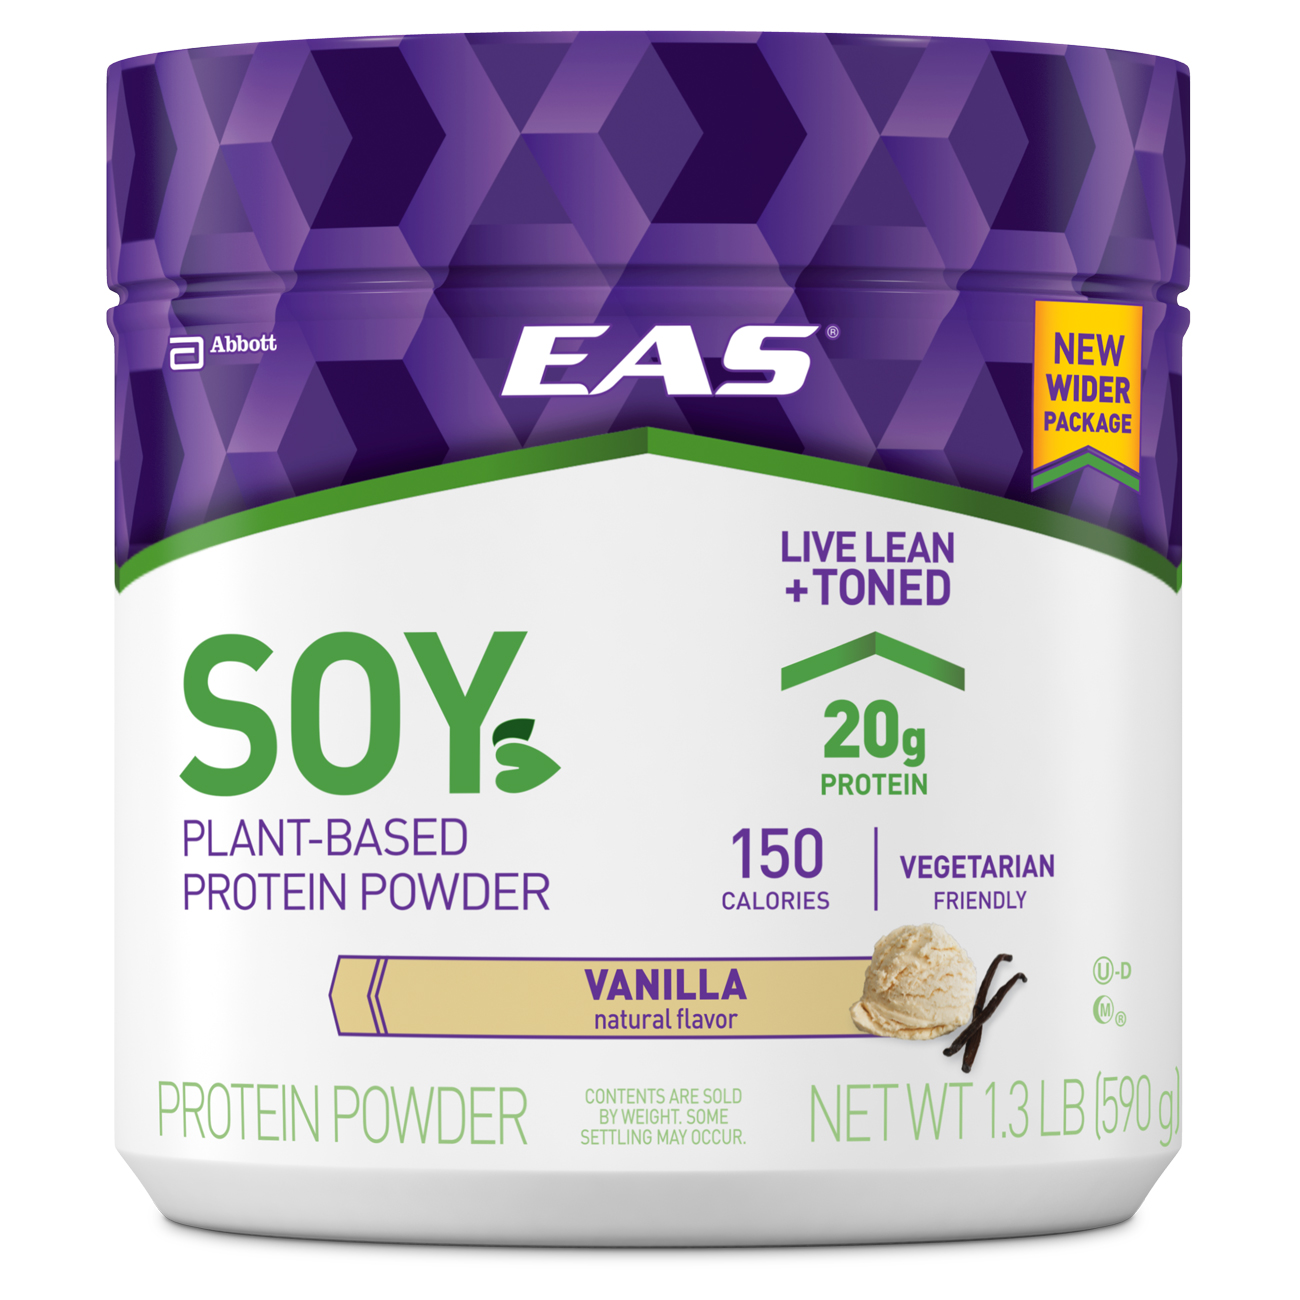 EAS Soy Protein Powder, Vanilla, 1.3 lb